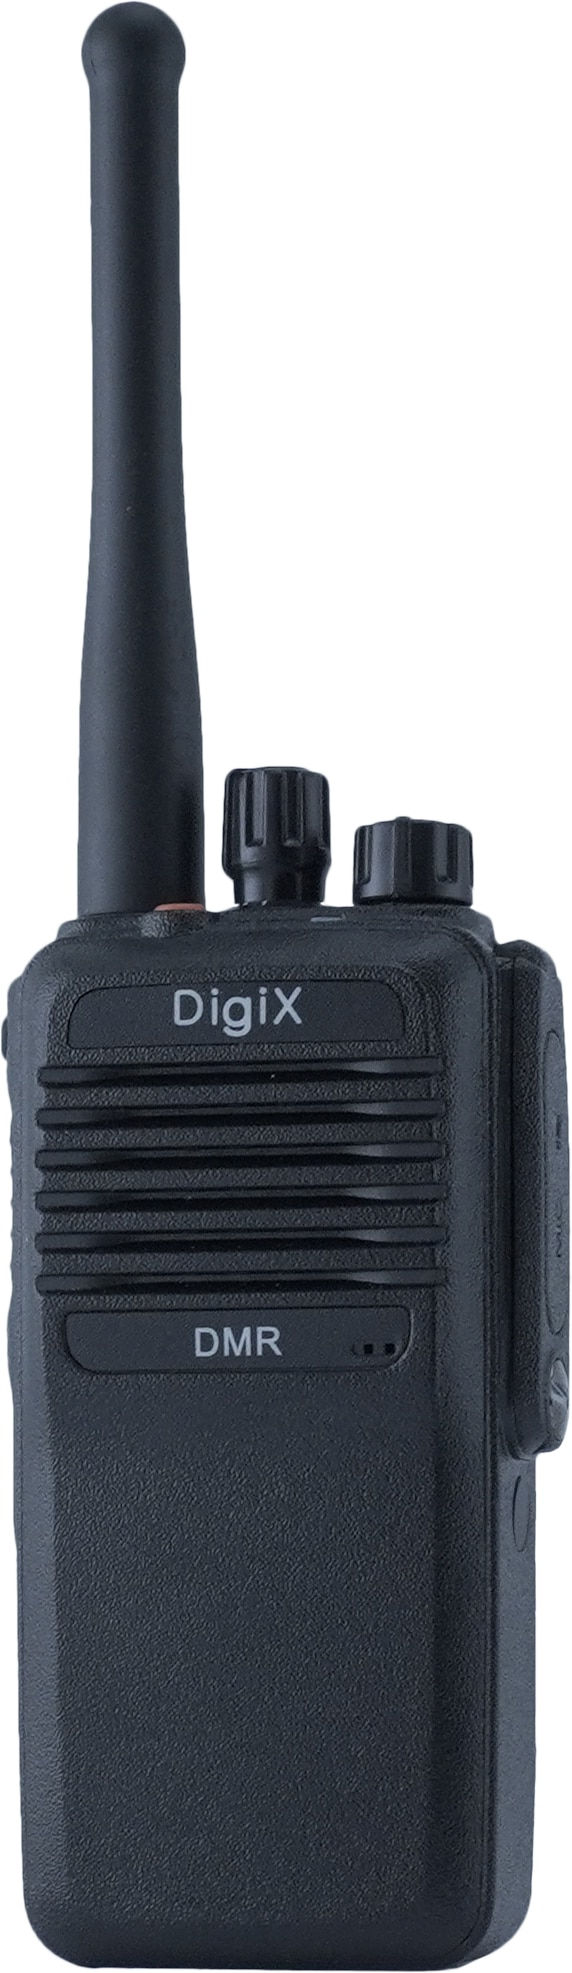 DigiX DMR front